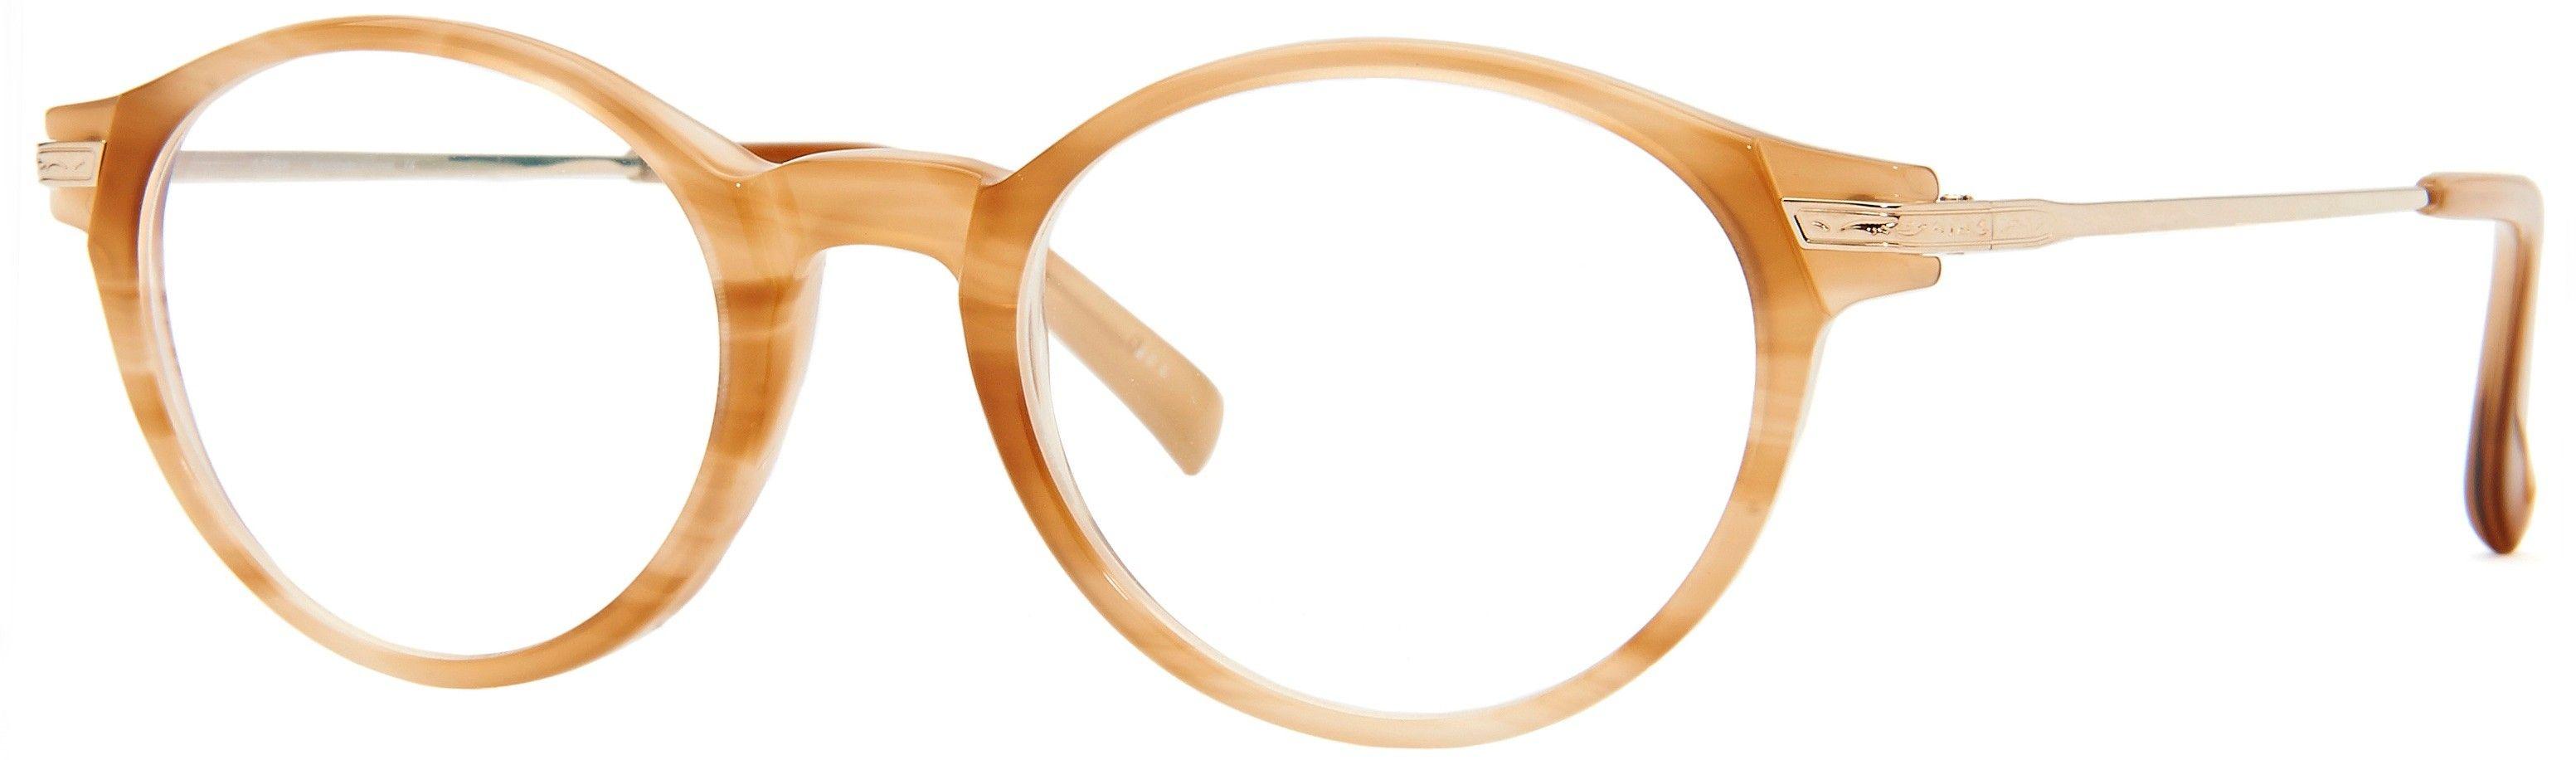 Masunaga GMS-810 Light Brown glasses   some extra   Pinterest ...